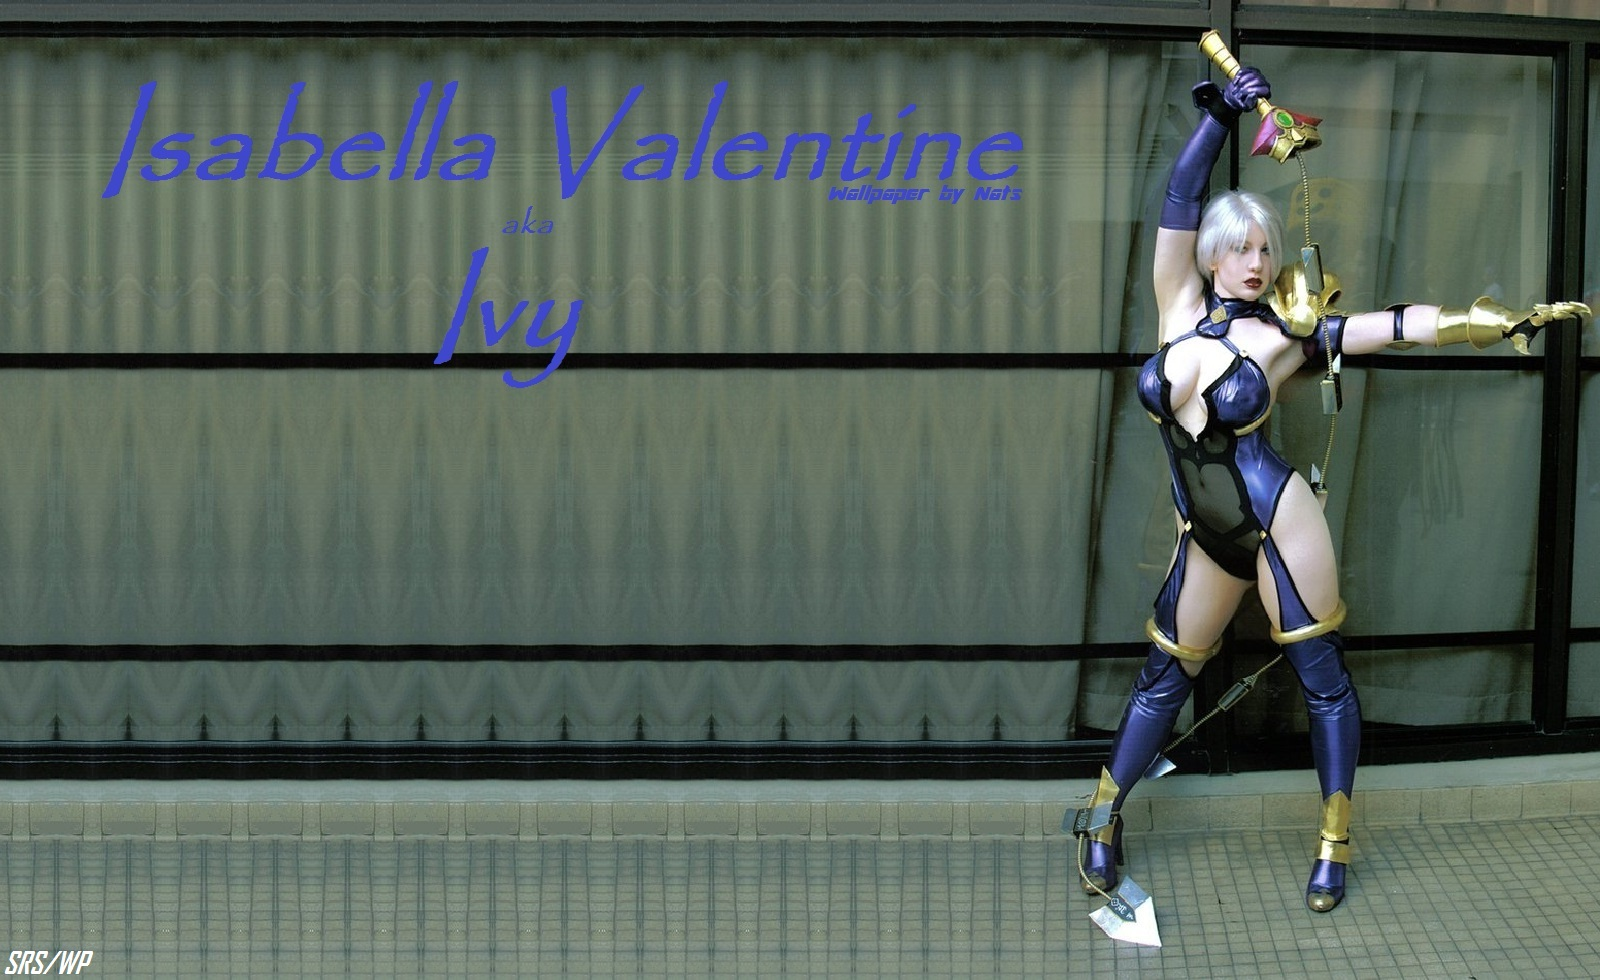 free download high quality isabella valentine aka ivy - Isabella Valentine Free